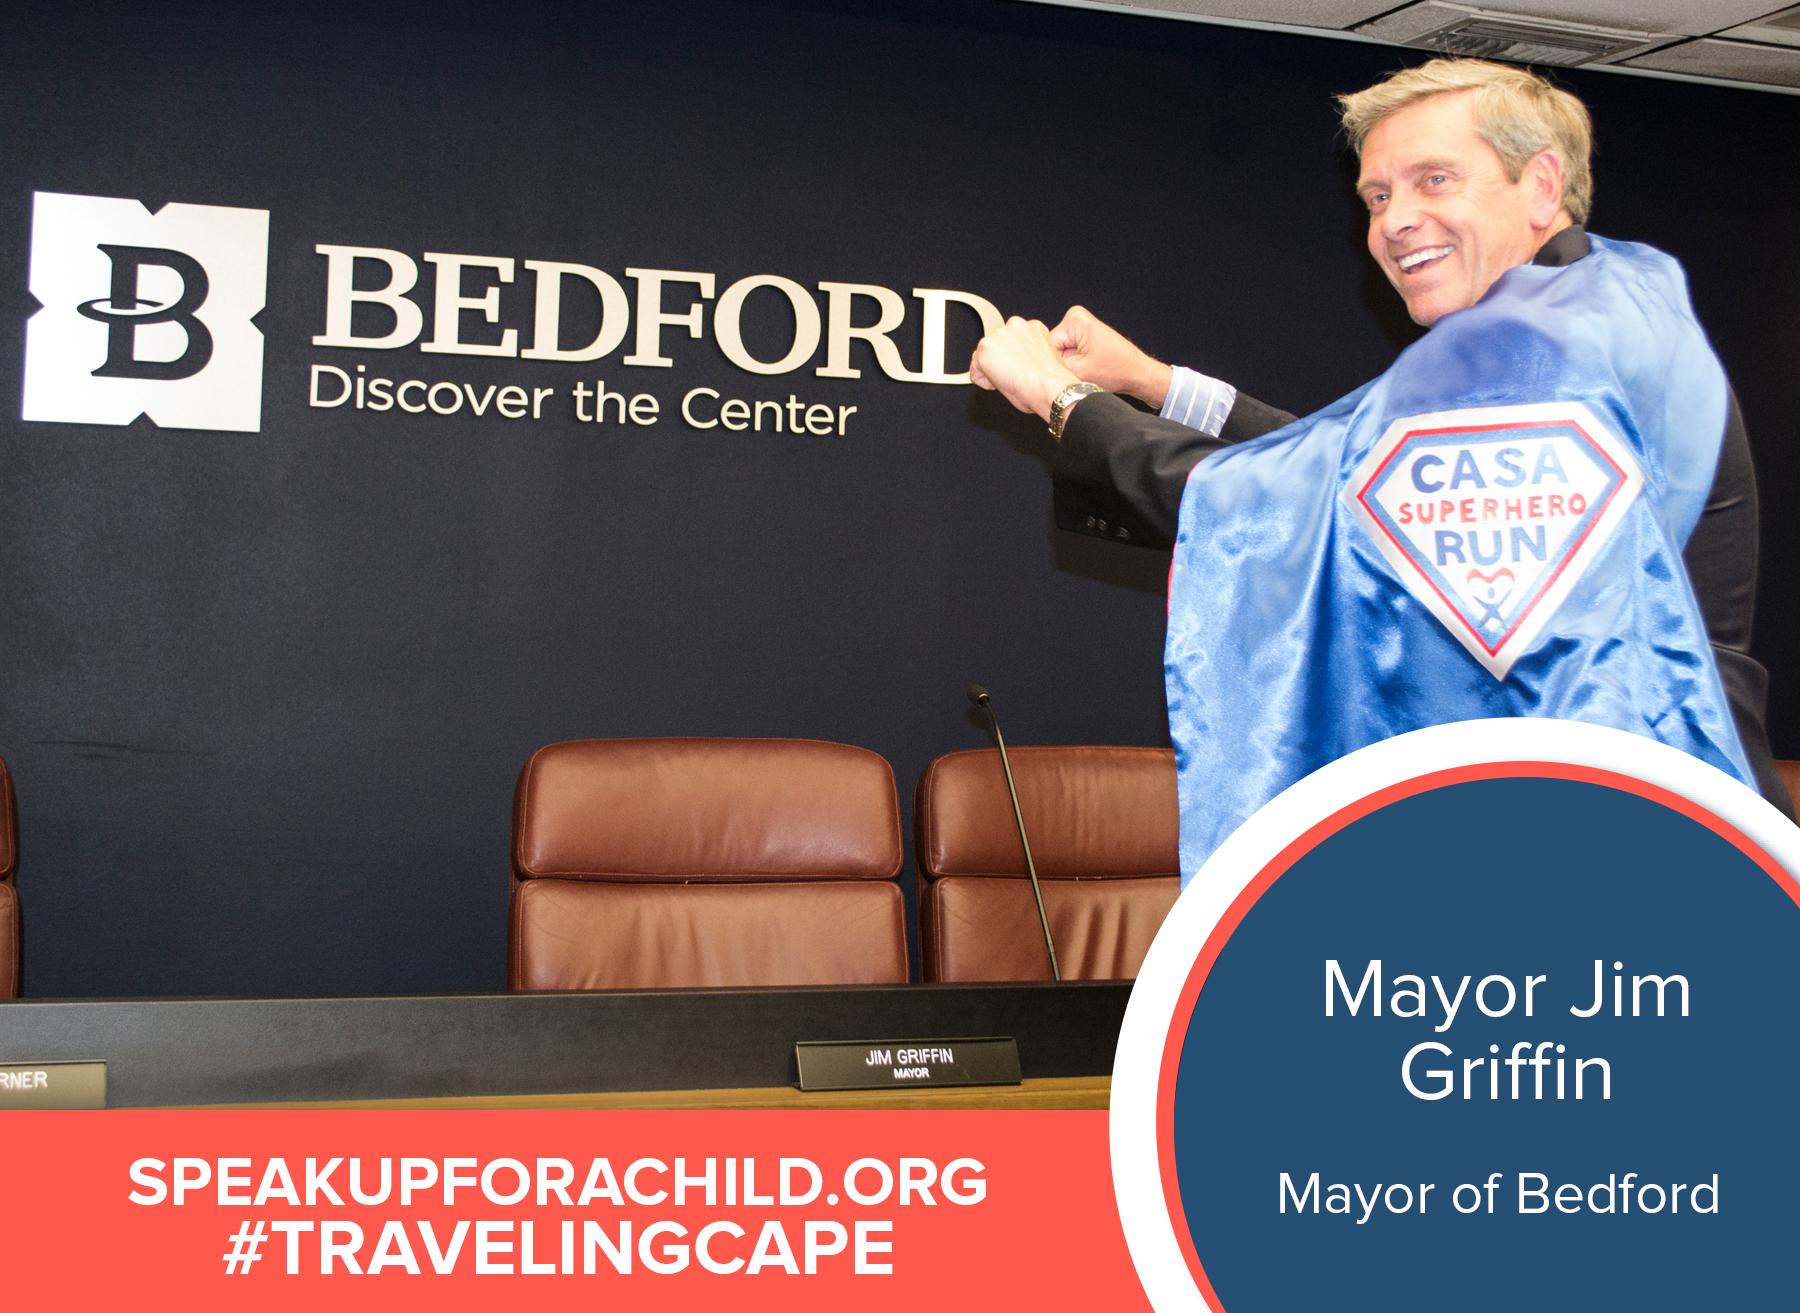 MayorGriffin.jpg